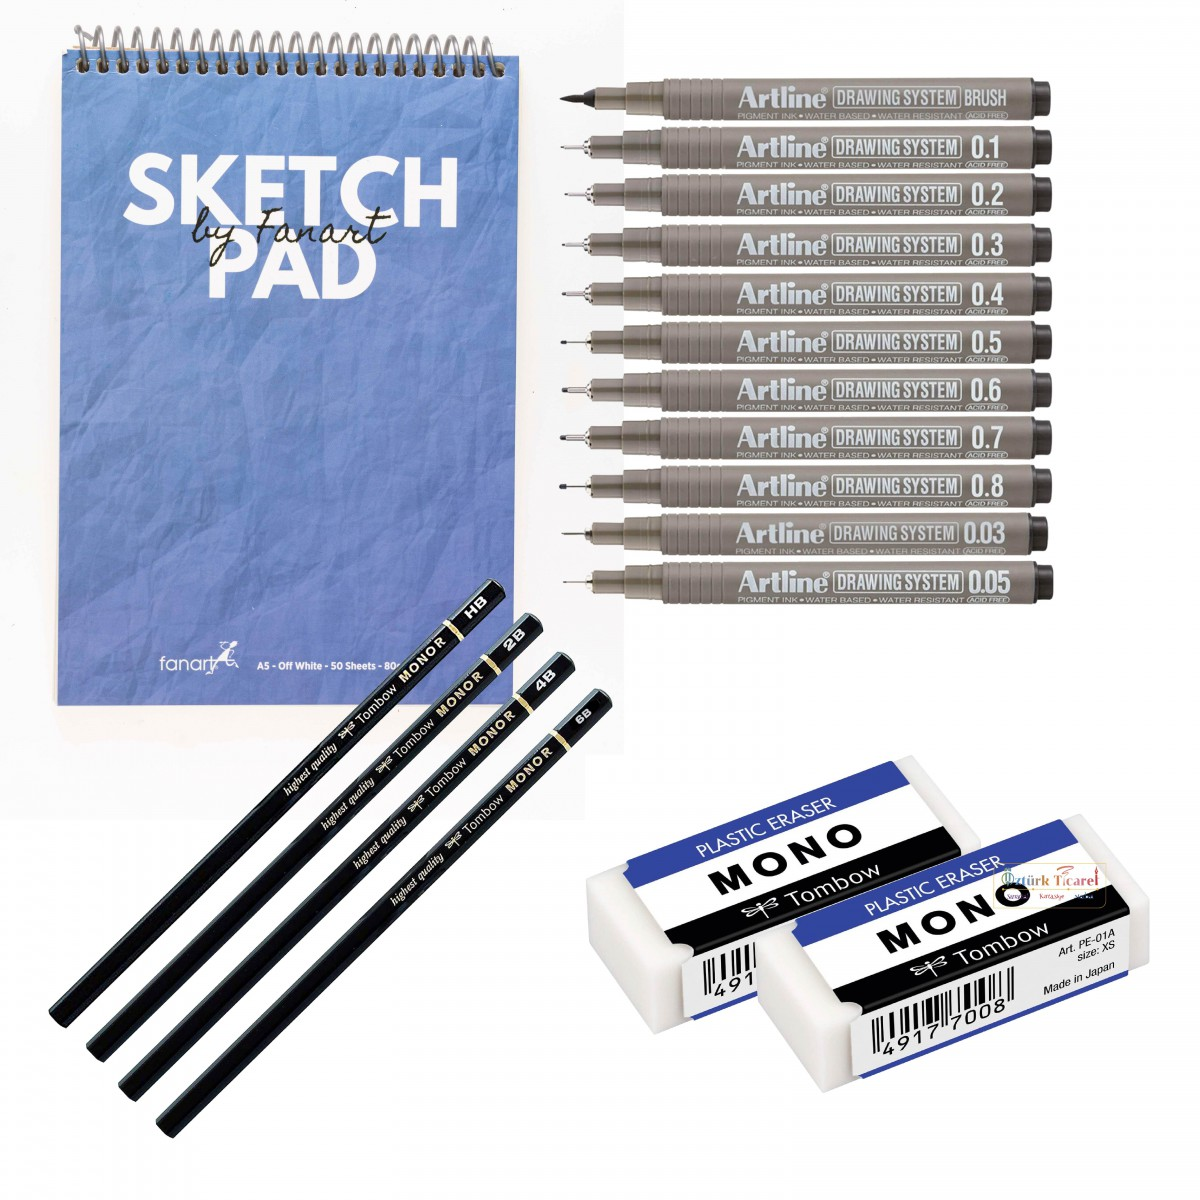 Lüks A4 Eskiz Başlangıç Seti - Akdeniz Mavisi (Tombow Mono Rs 4'lü + Mono Silgi 2'li + Fanart Sketch Pad A4 Akdeniz Mavisi + Artline Drawing 11'li)